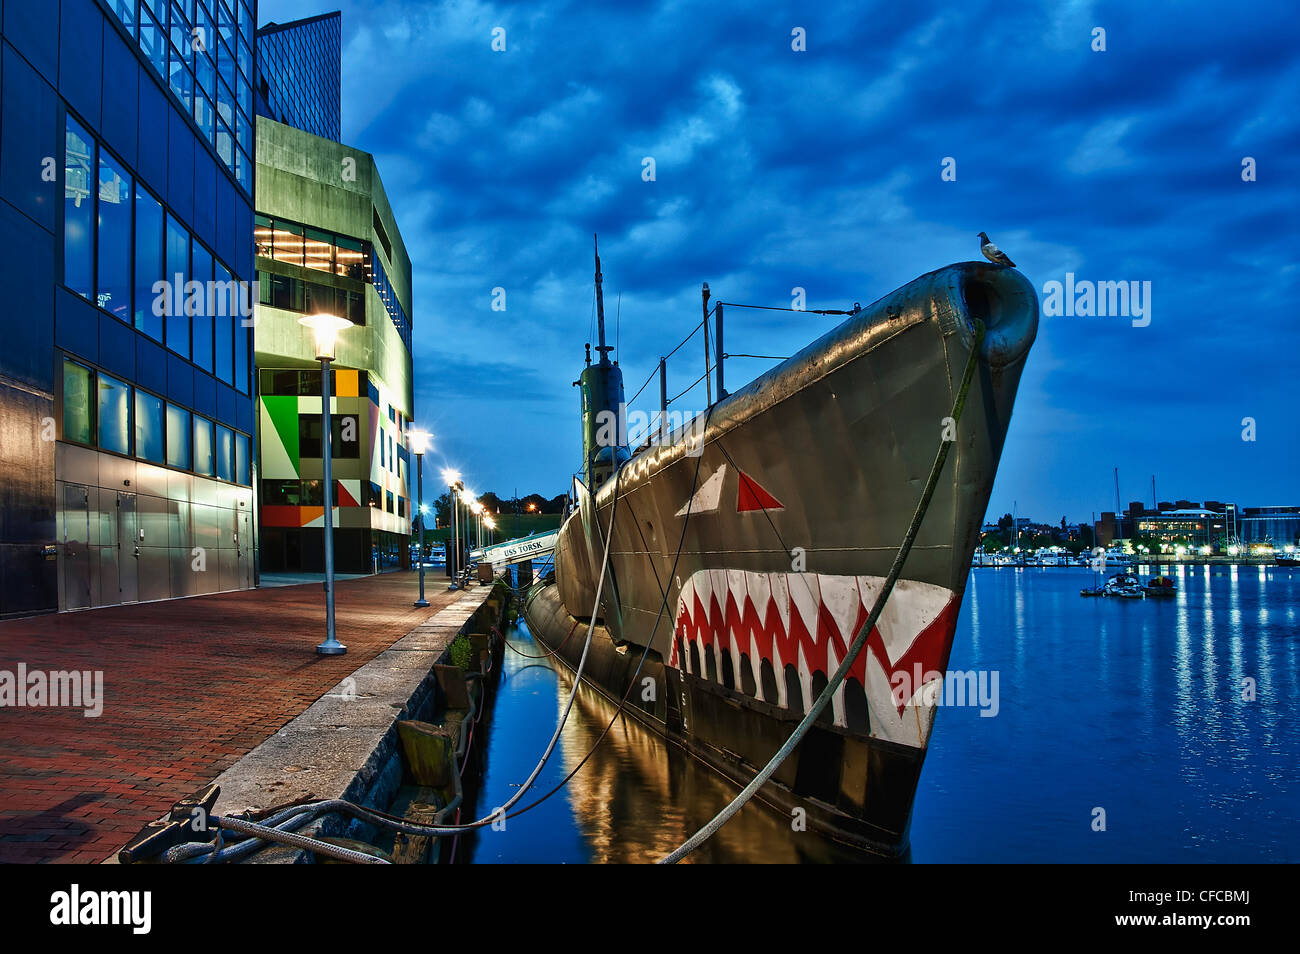 Submarino USS Torsk, Memorial, el Inner Harbor, Barltimore, Maryland, EE.UU Imagen De Stock